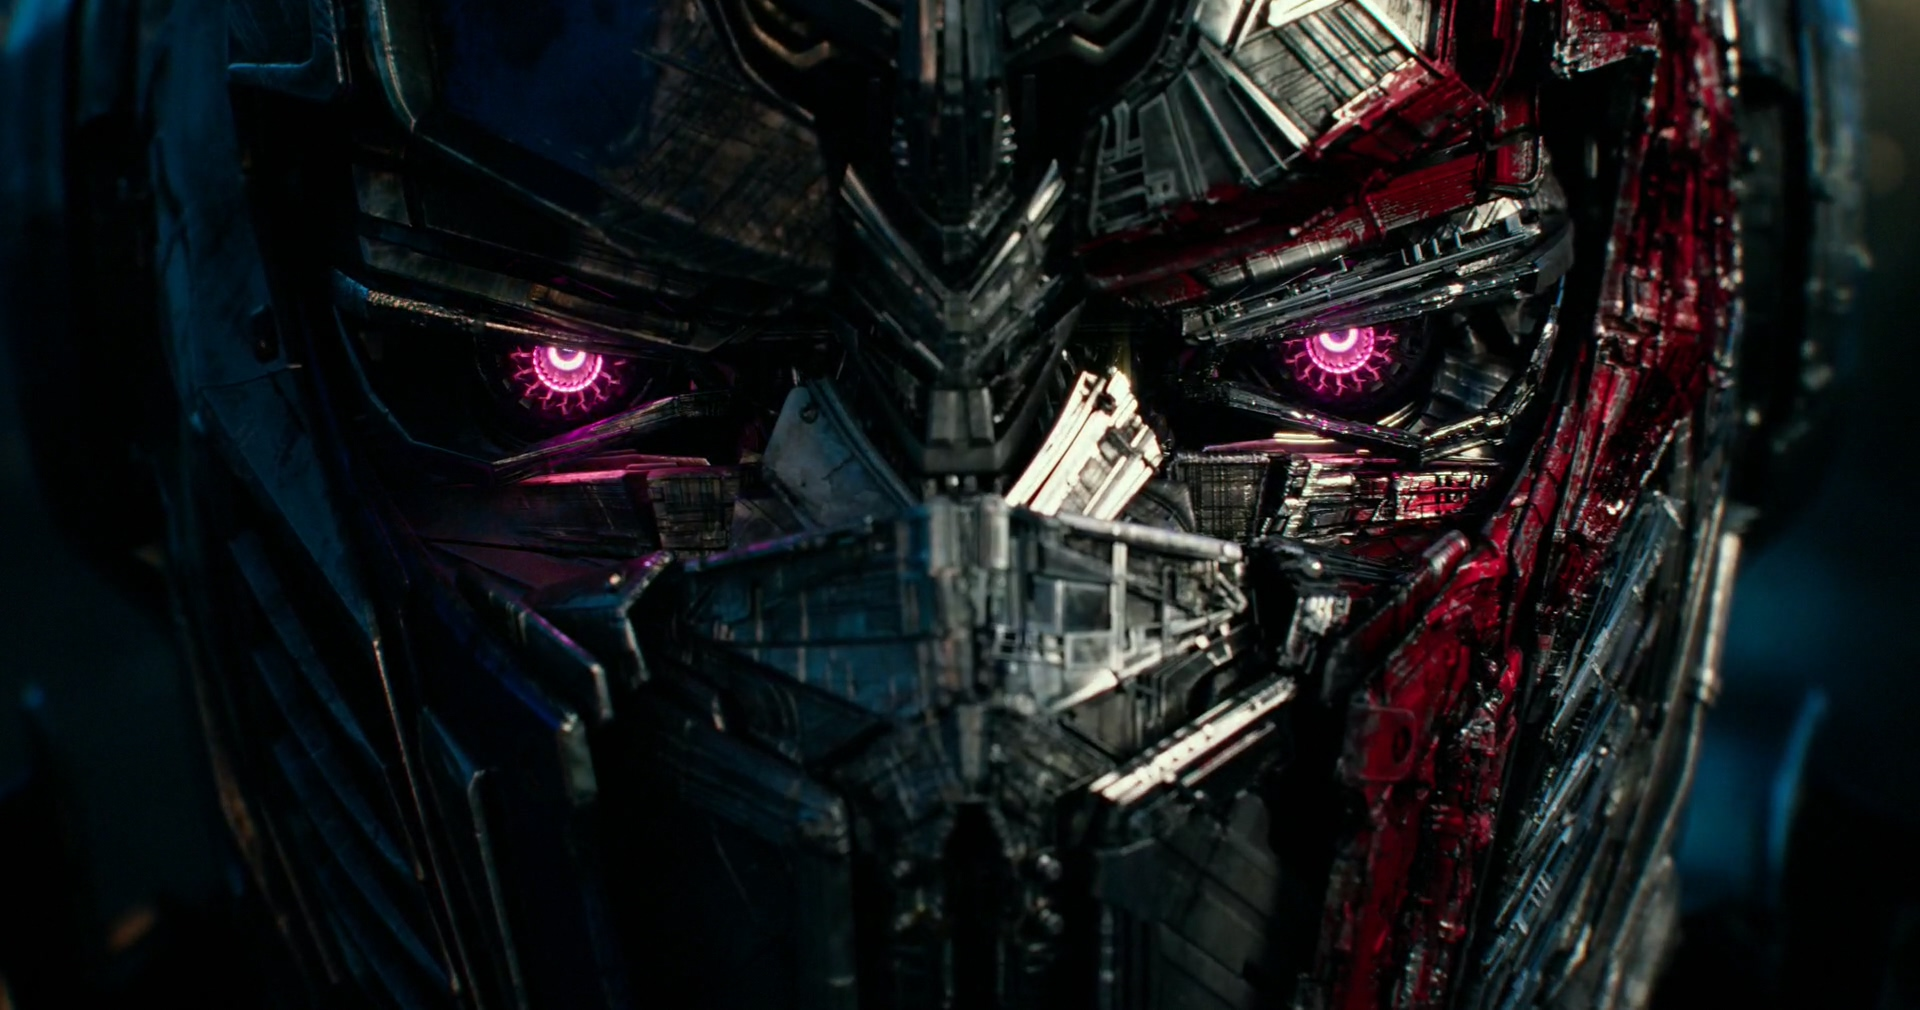 transformers_the_last_knight_193303_960.jpg